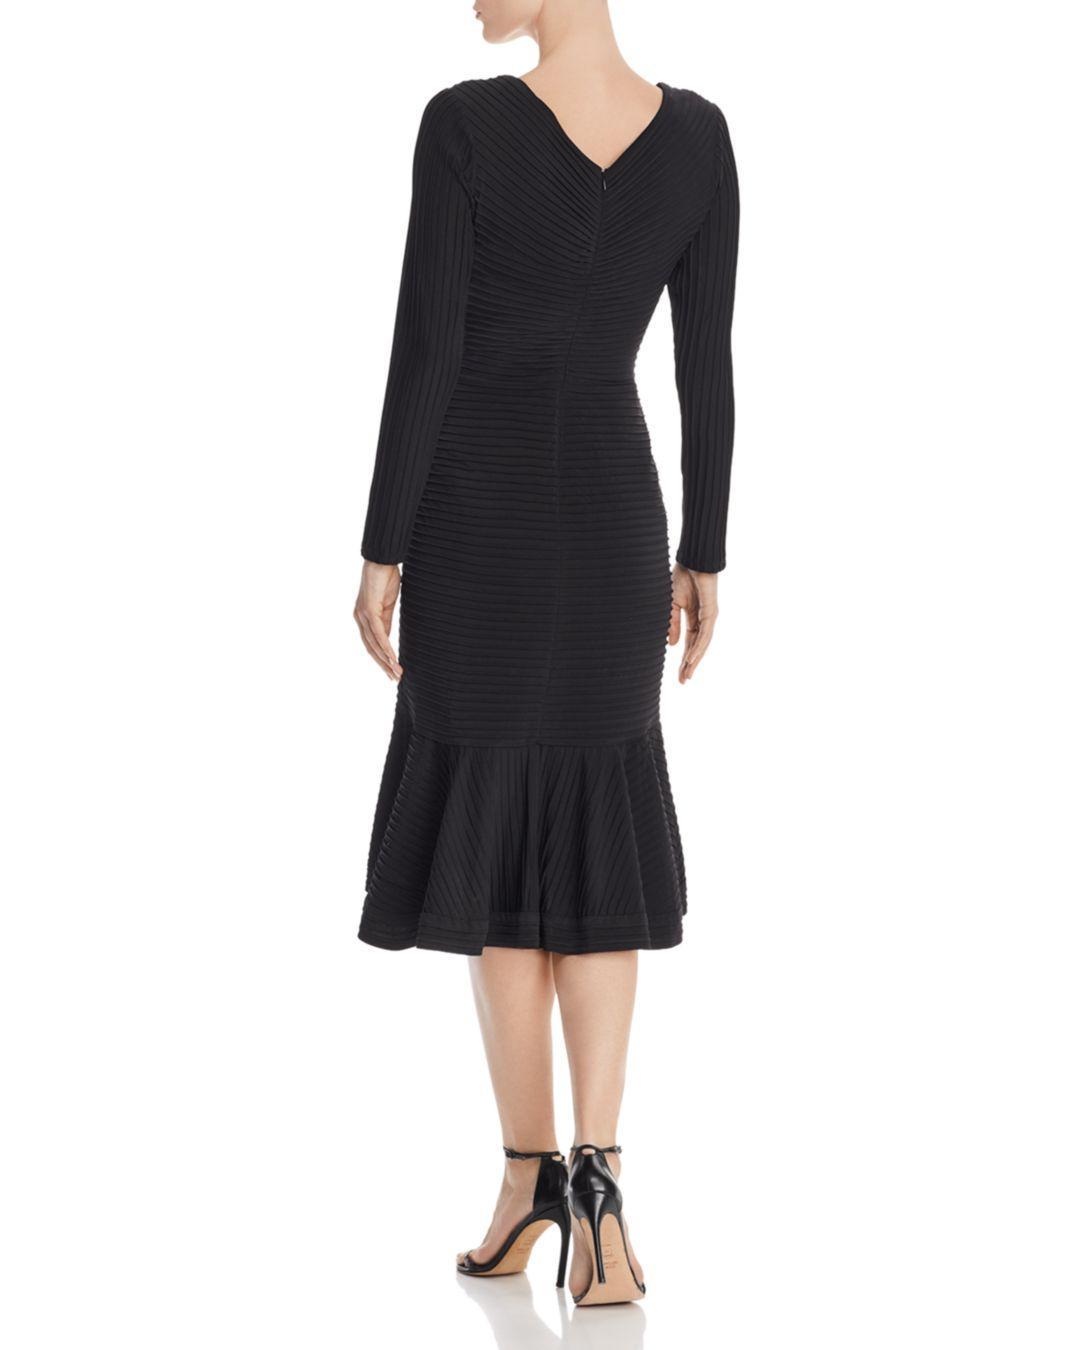 63913216a4fe Lyst - Tadashi Shoji Pintuck Trumpet Dress in Black - Save 25%